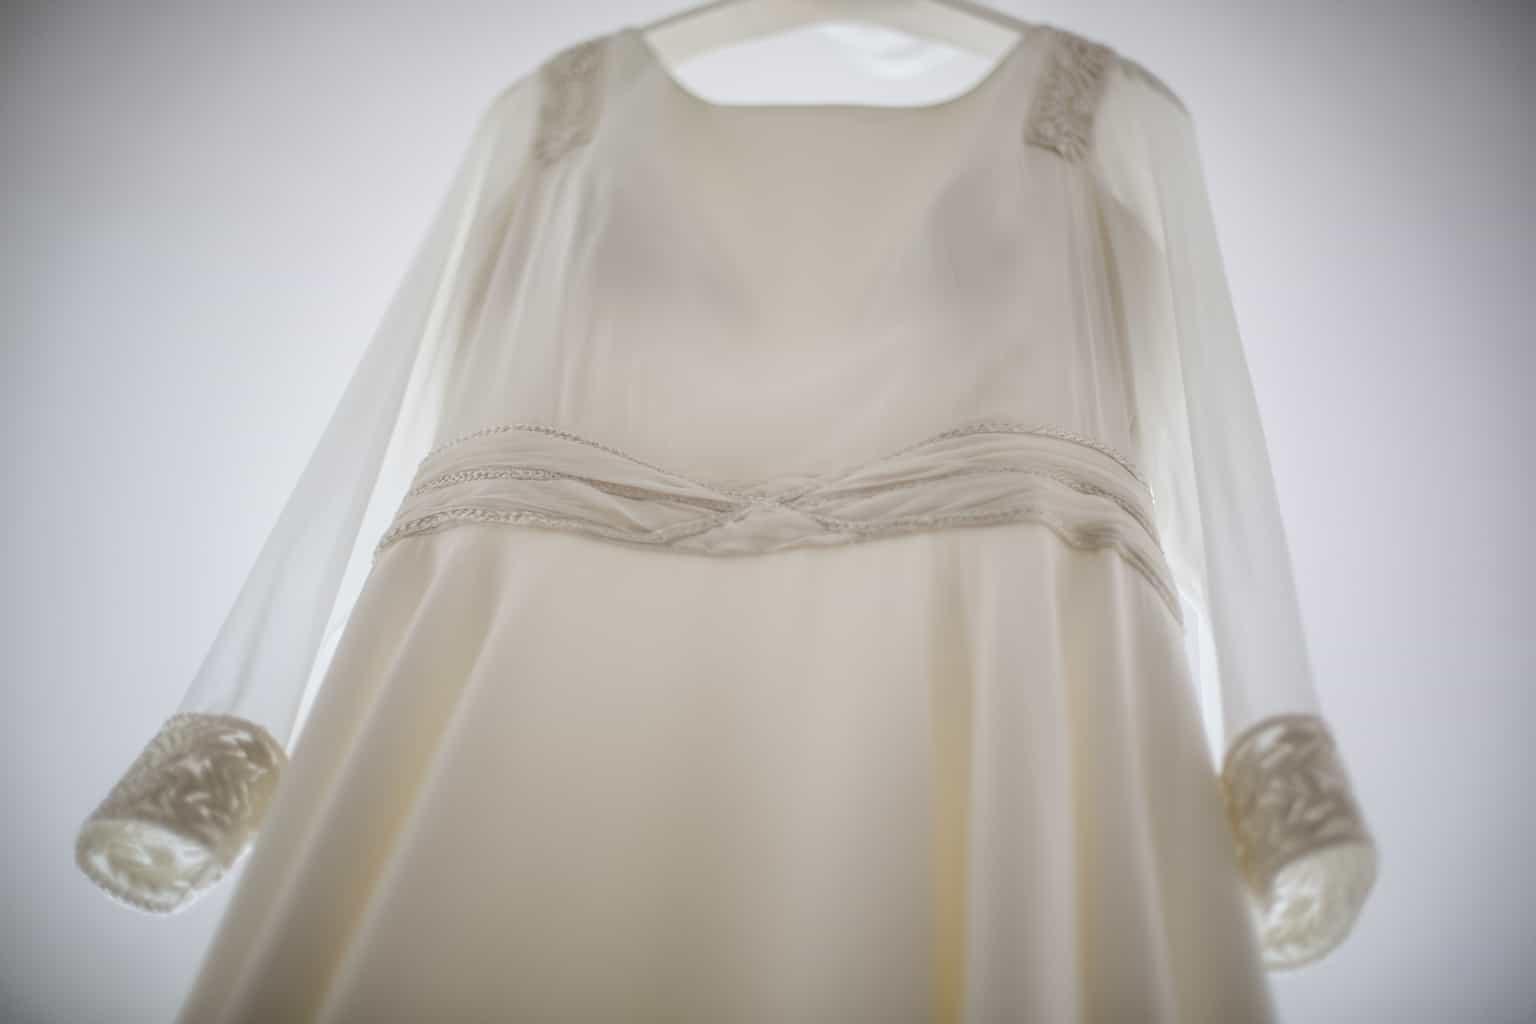 Bajo la falda 0079 falda gris tanga blanca de paseo culona parte 2 - 5 1